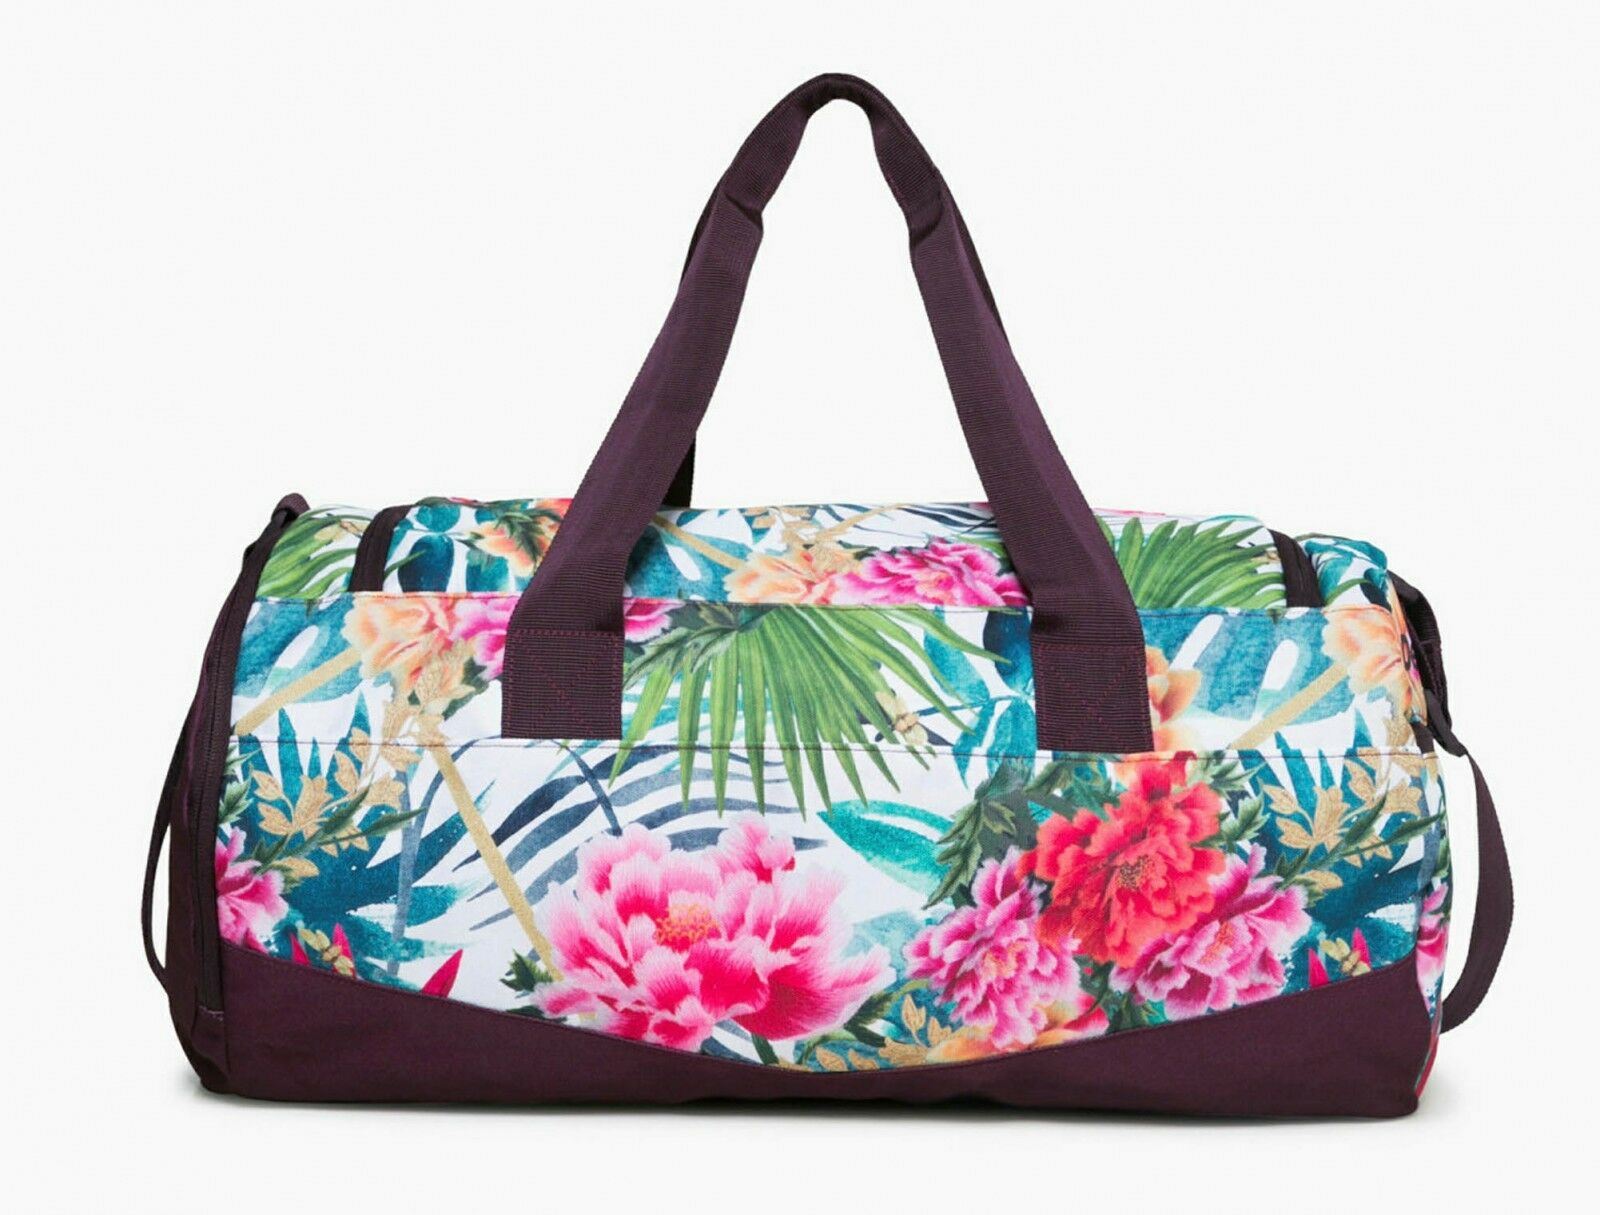 Desigual Desigual Desigual Tropic Tube Shoulder Bag Sporttasche Umhängetasche Schultertasche 413e0e